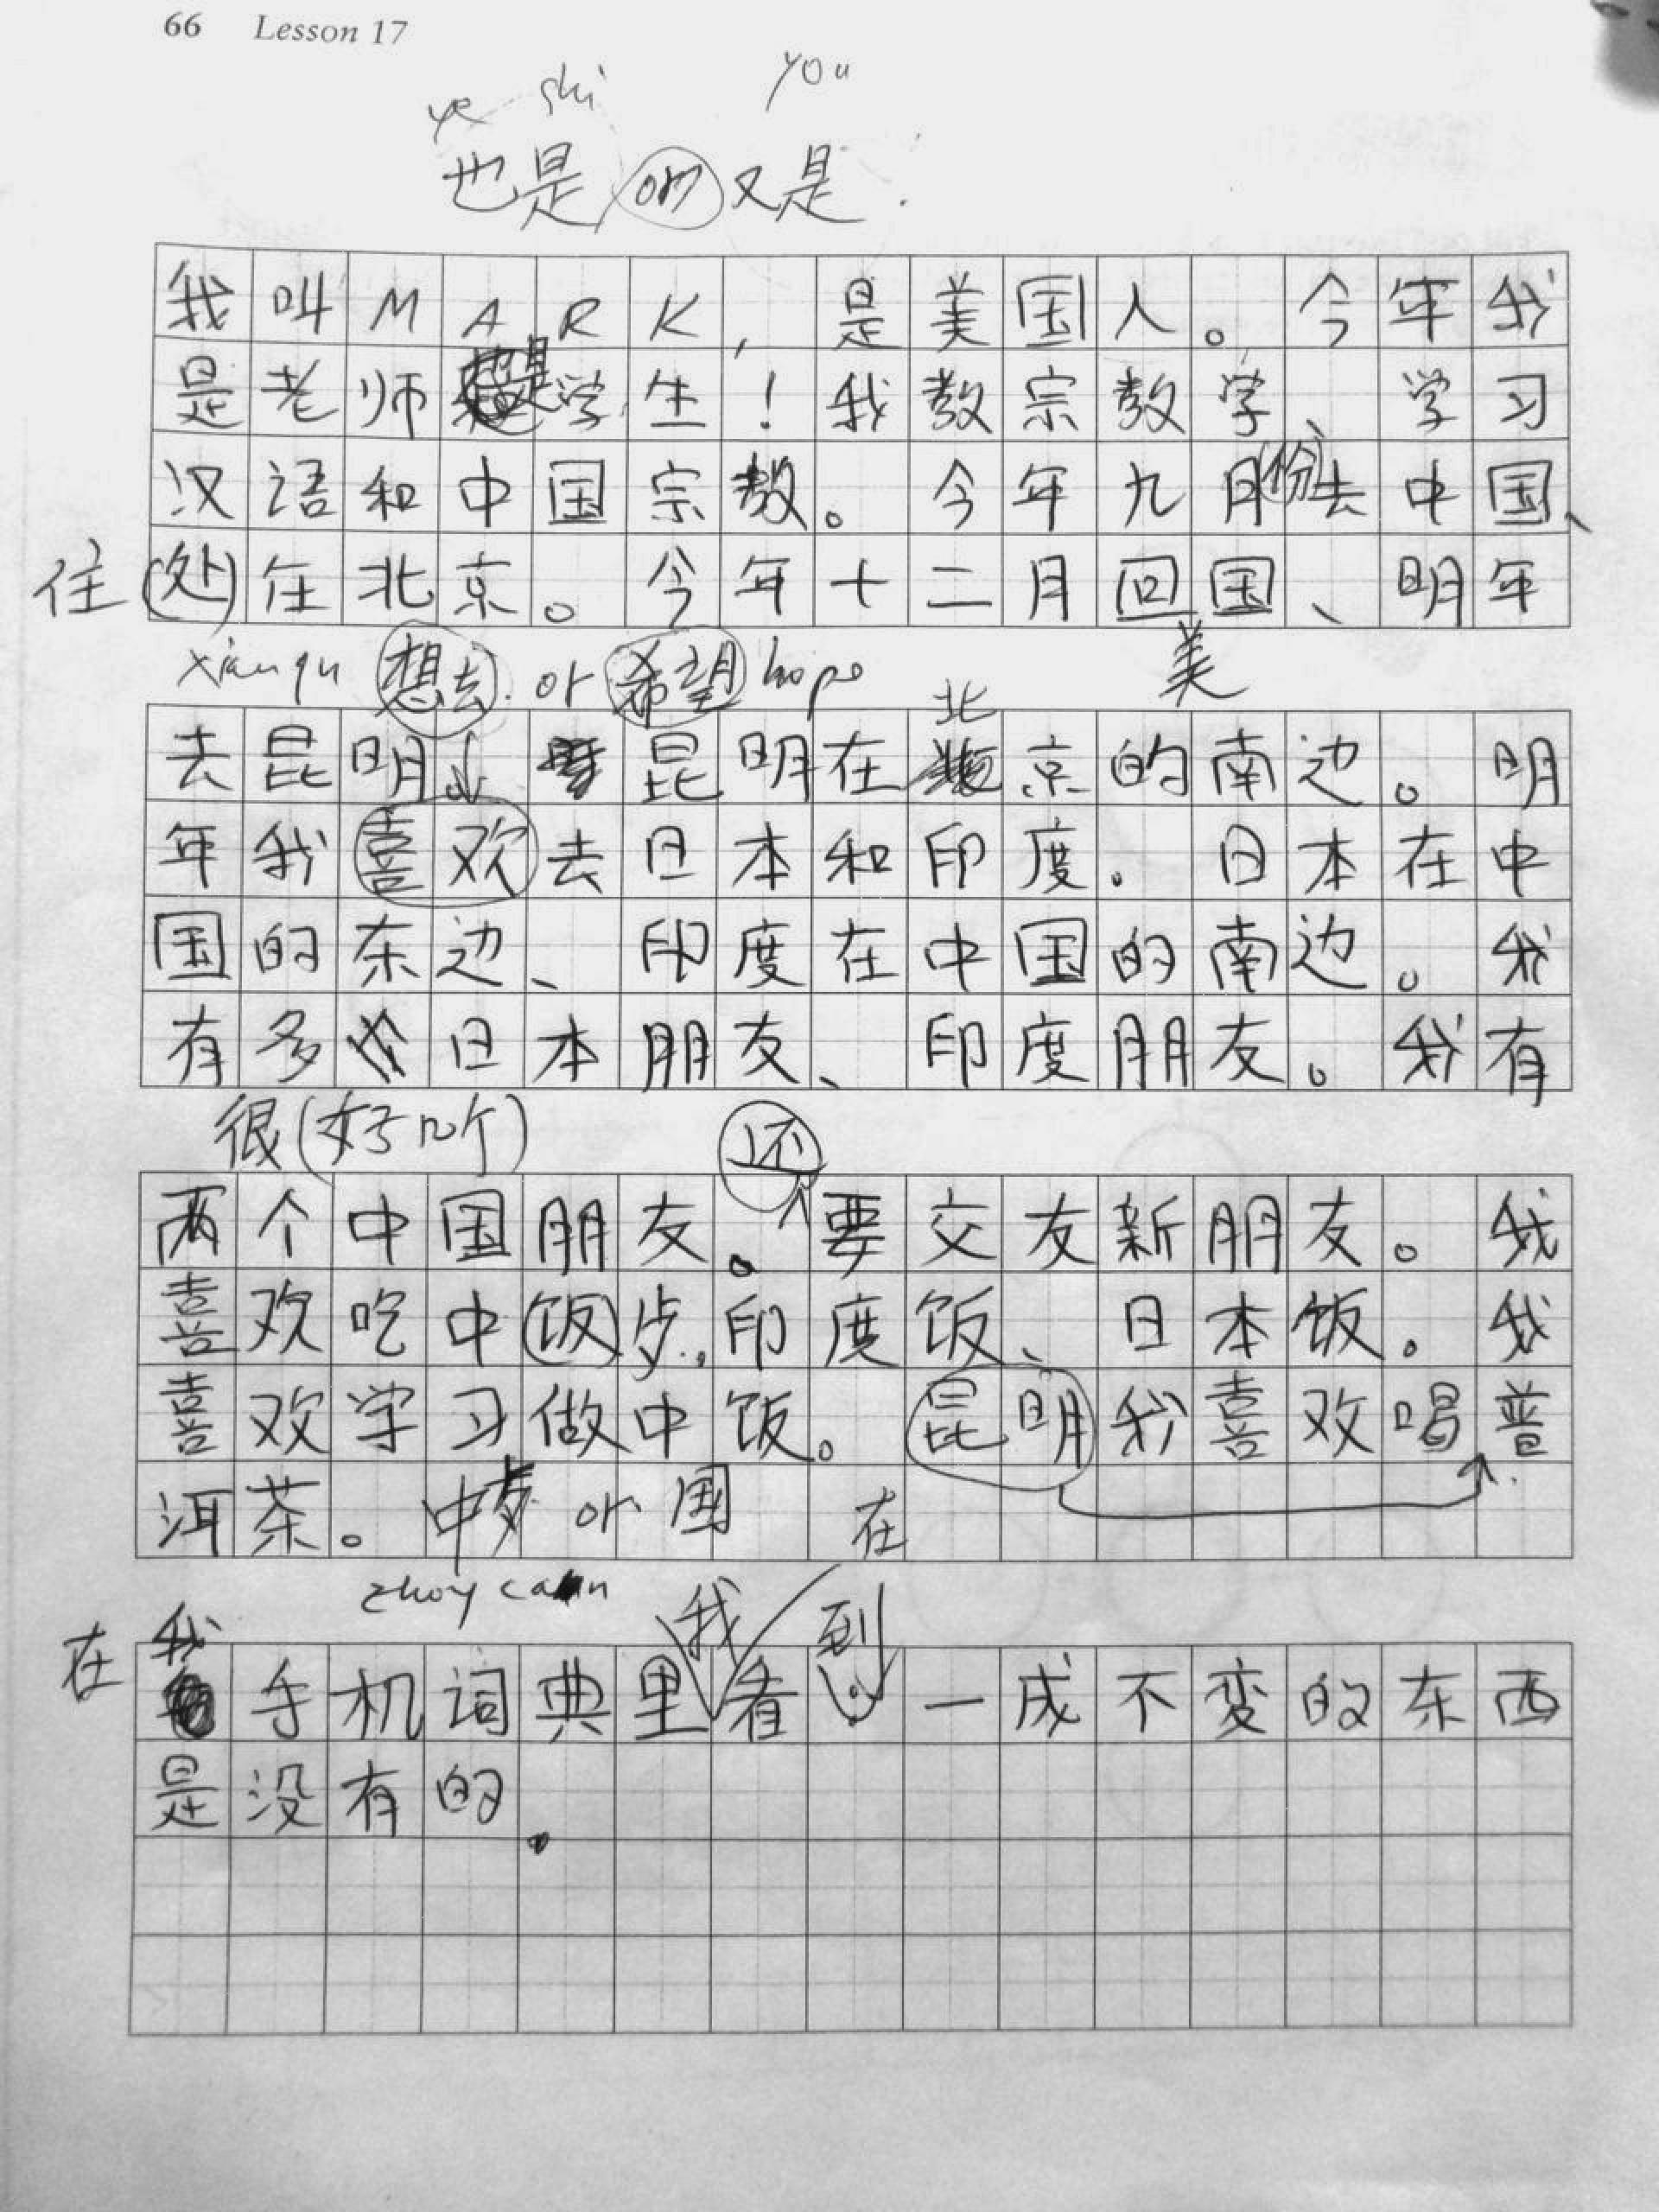 015 Essay Example Chinese Amazing Art Topics Vce Formats Sheet 1920